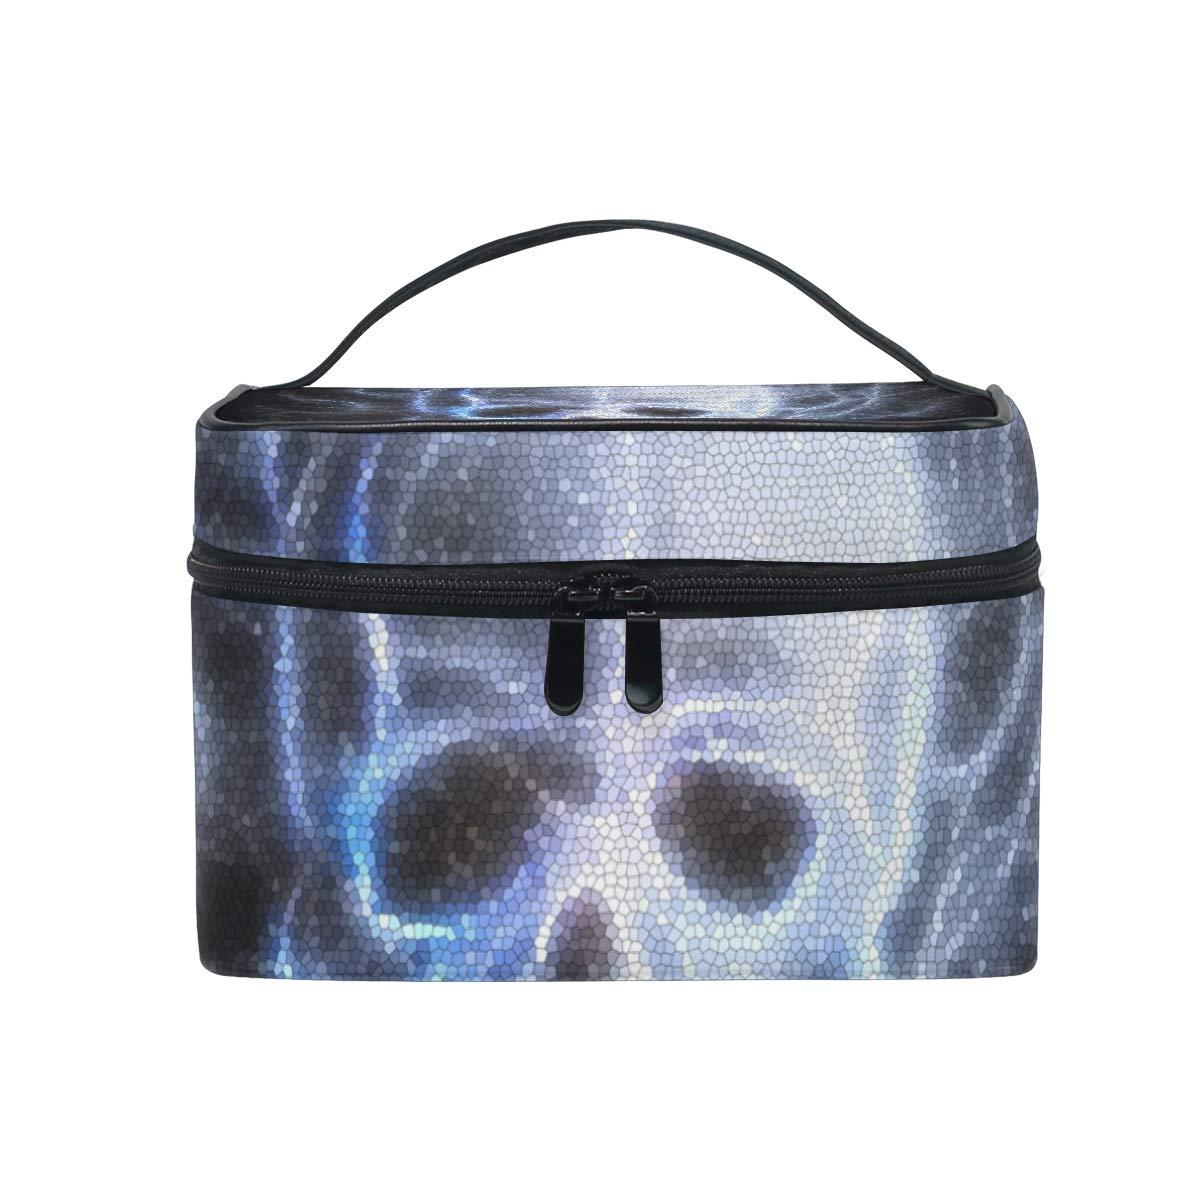 OREZI Skull Fractal Travel Makeup Case Cosmetic Bag for Girl Women, Large Capacity and Adjustable Makeup Bags Travel Waterproof Toiletry Bag Accessories Organizer